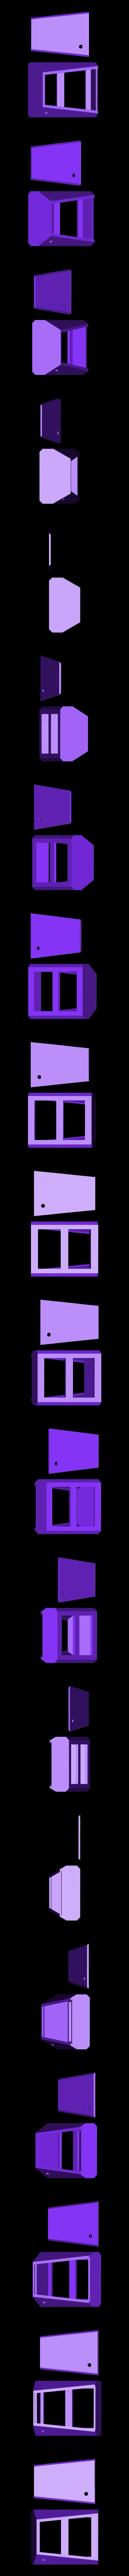 dual thermostat.stl Download STL file Dual temperature display for 3D printer Ikea Lack enclosure. • Object to 3D print, MxLabDesigns